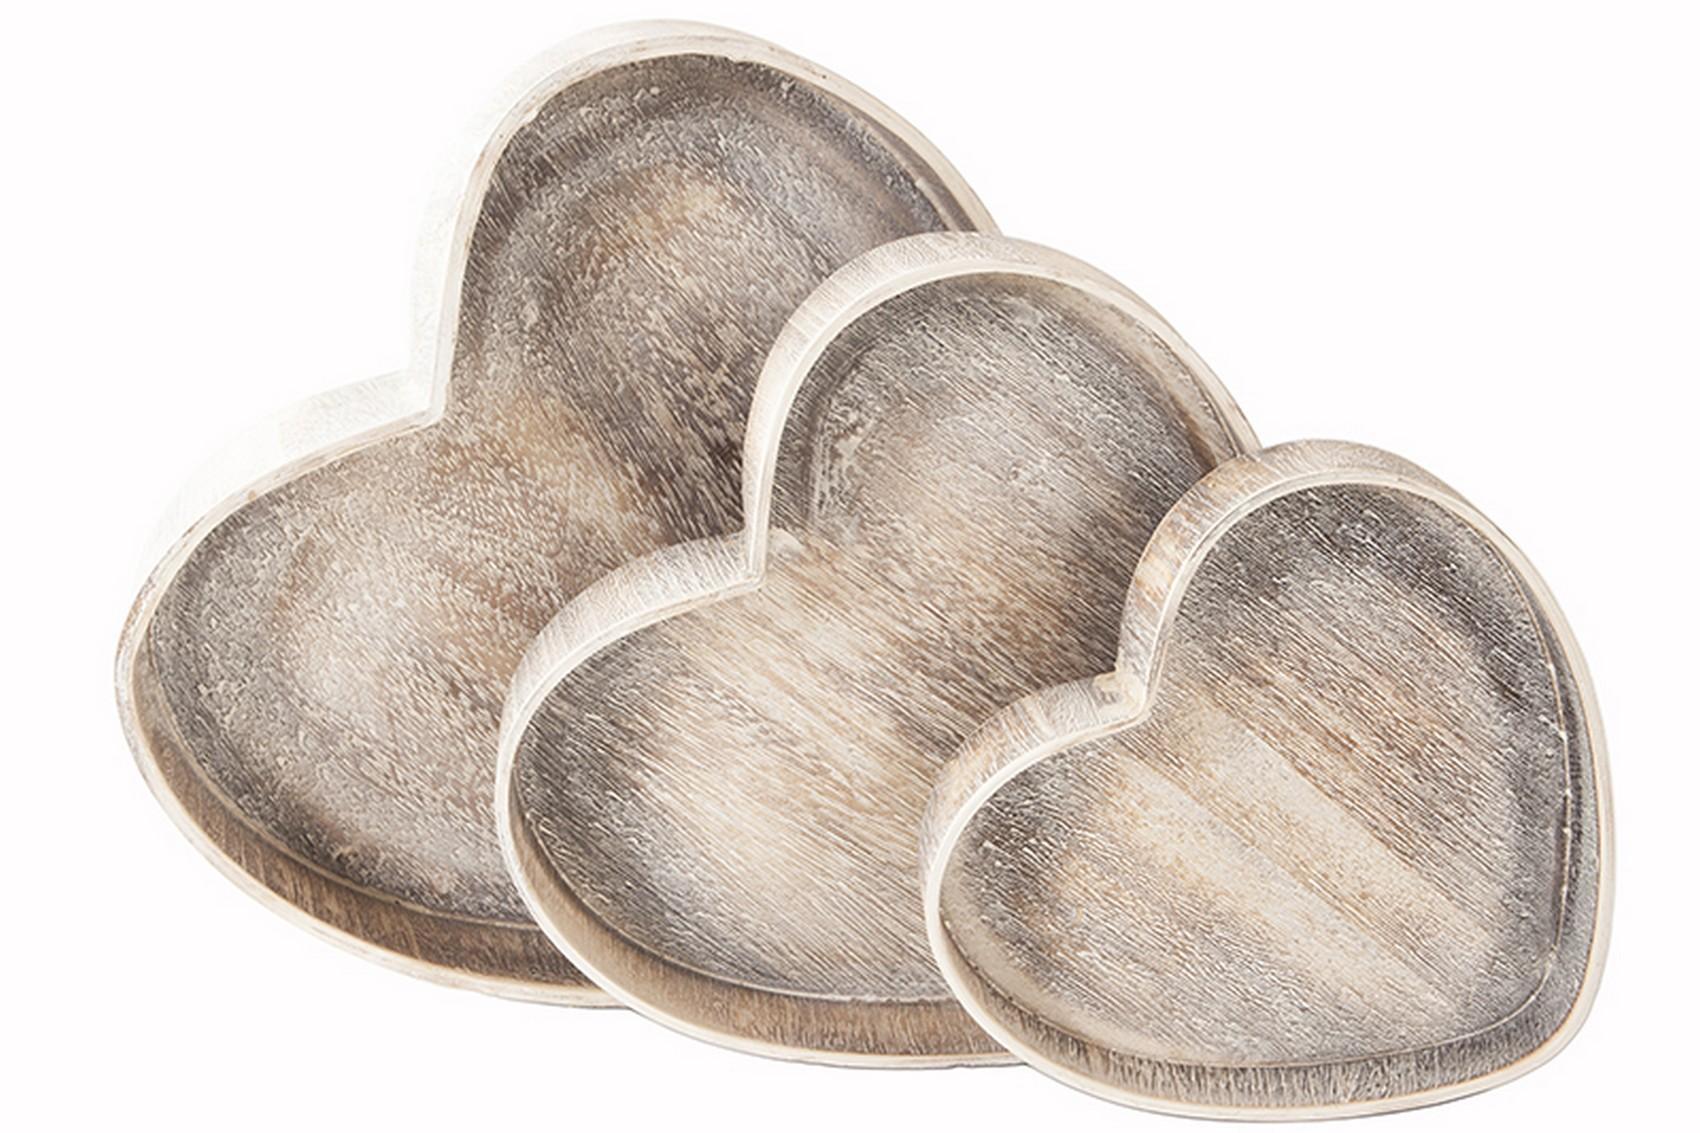 Rustic Farmhouse Style Heart Shaped Nesting High Lipped. Fireplace Mantel Ideas. Metal Porch Railing. Mediterranean Tile. Carrara Marble Backsplash. Chevron Floor Tile. Kitchen Drawer Organizers. Modern Bedroom Ideas. Tennessee Stone